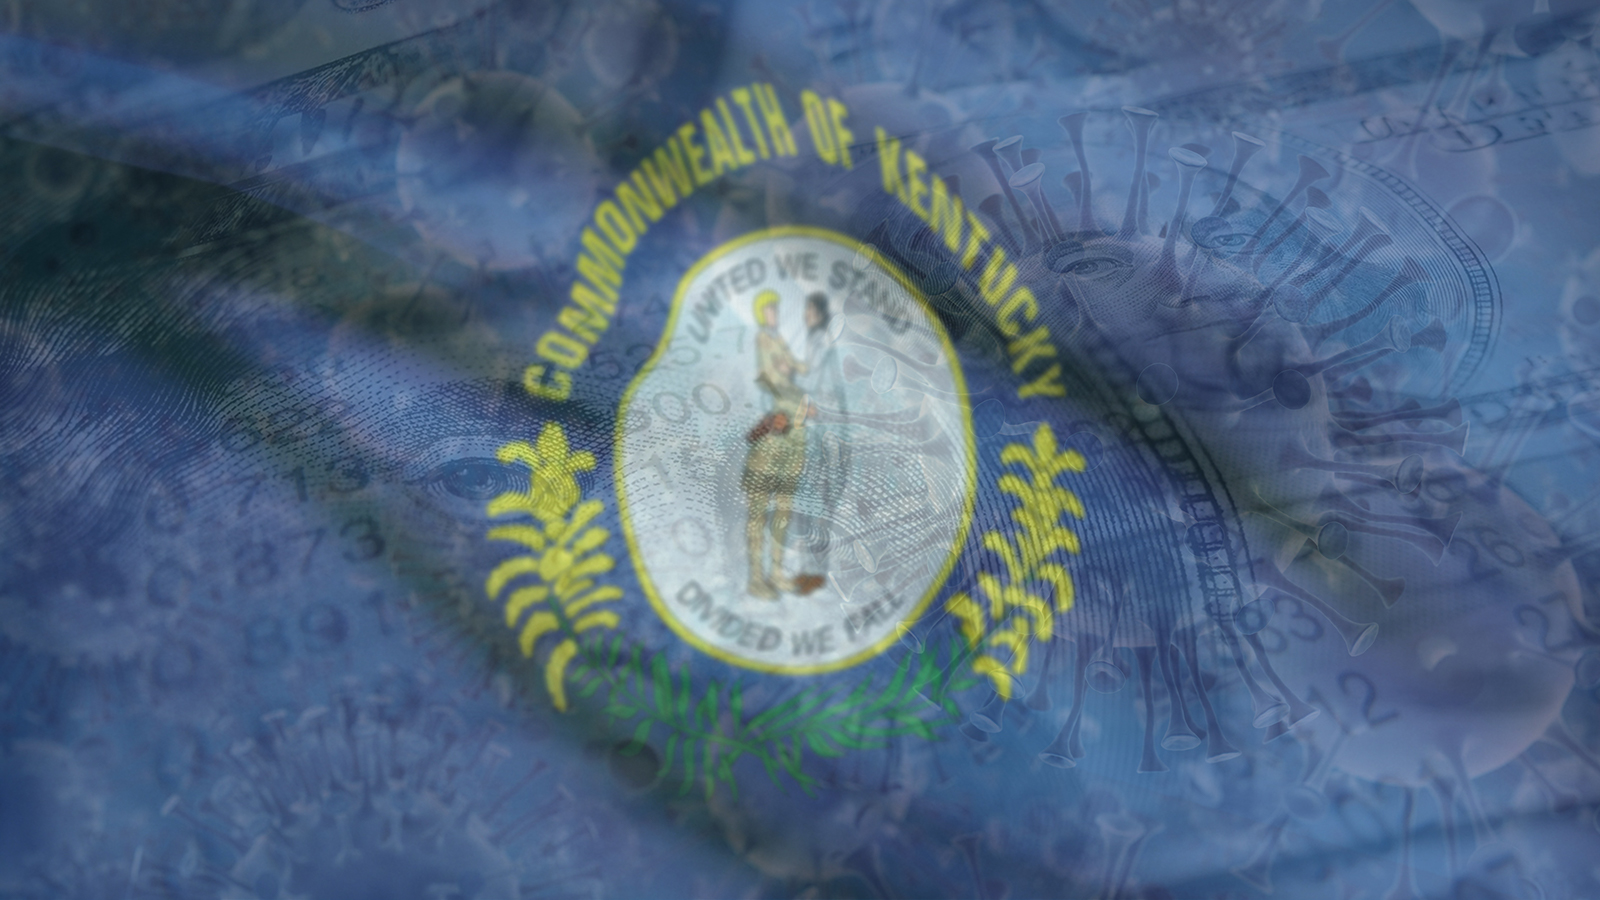 Kentucky Announces Million Dollar/Scholarship Vaccination Lotteries